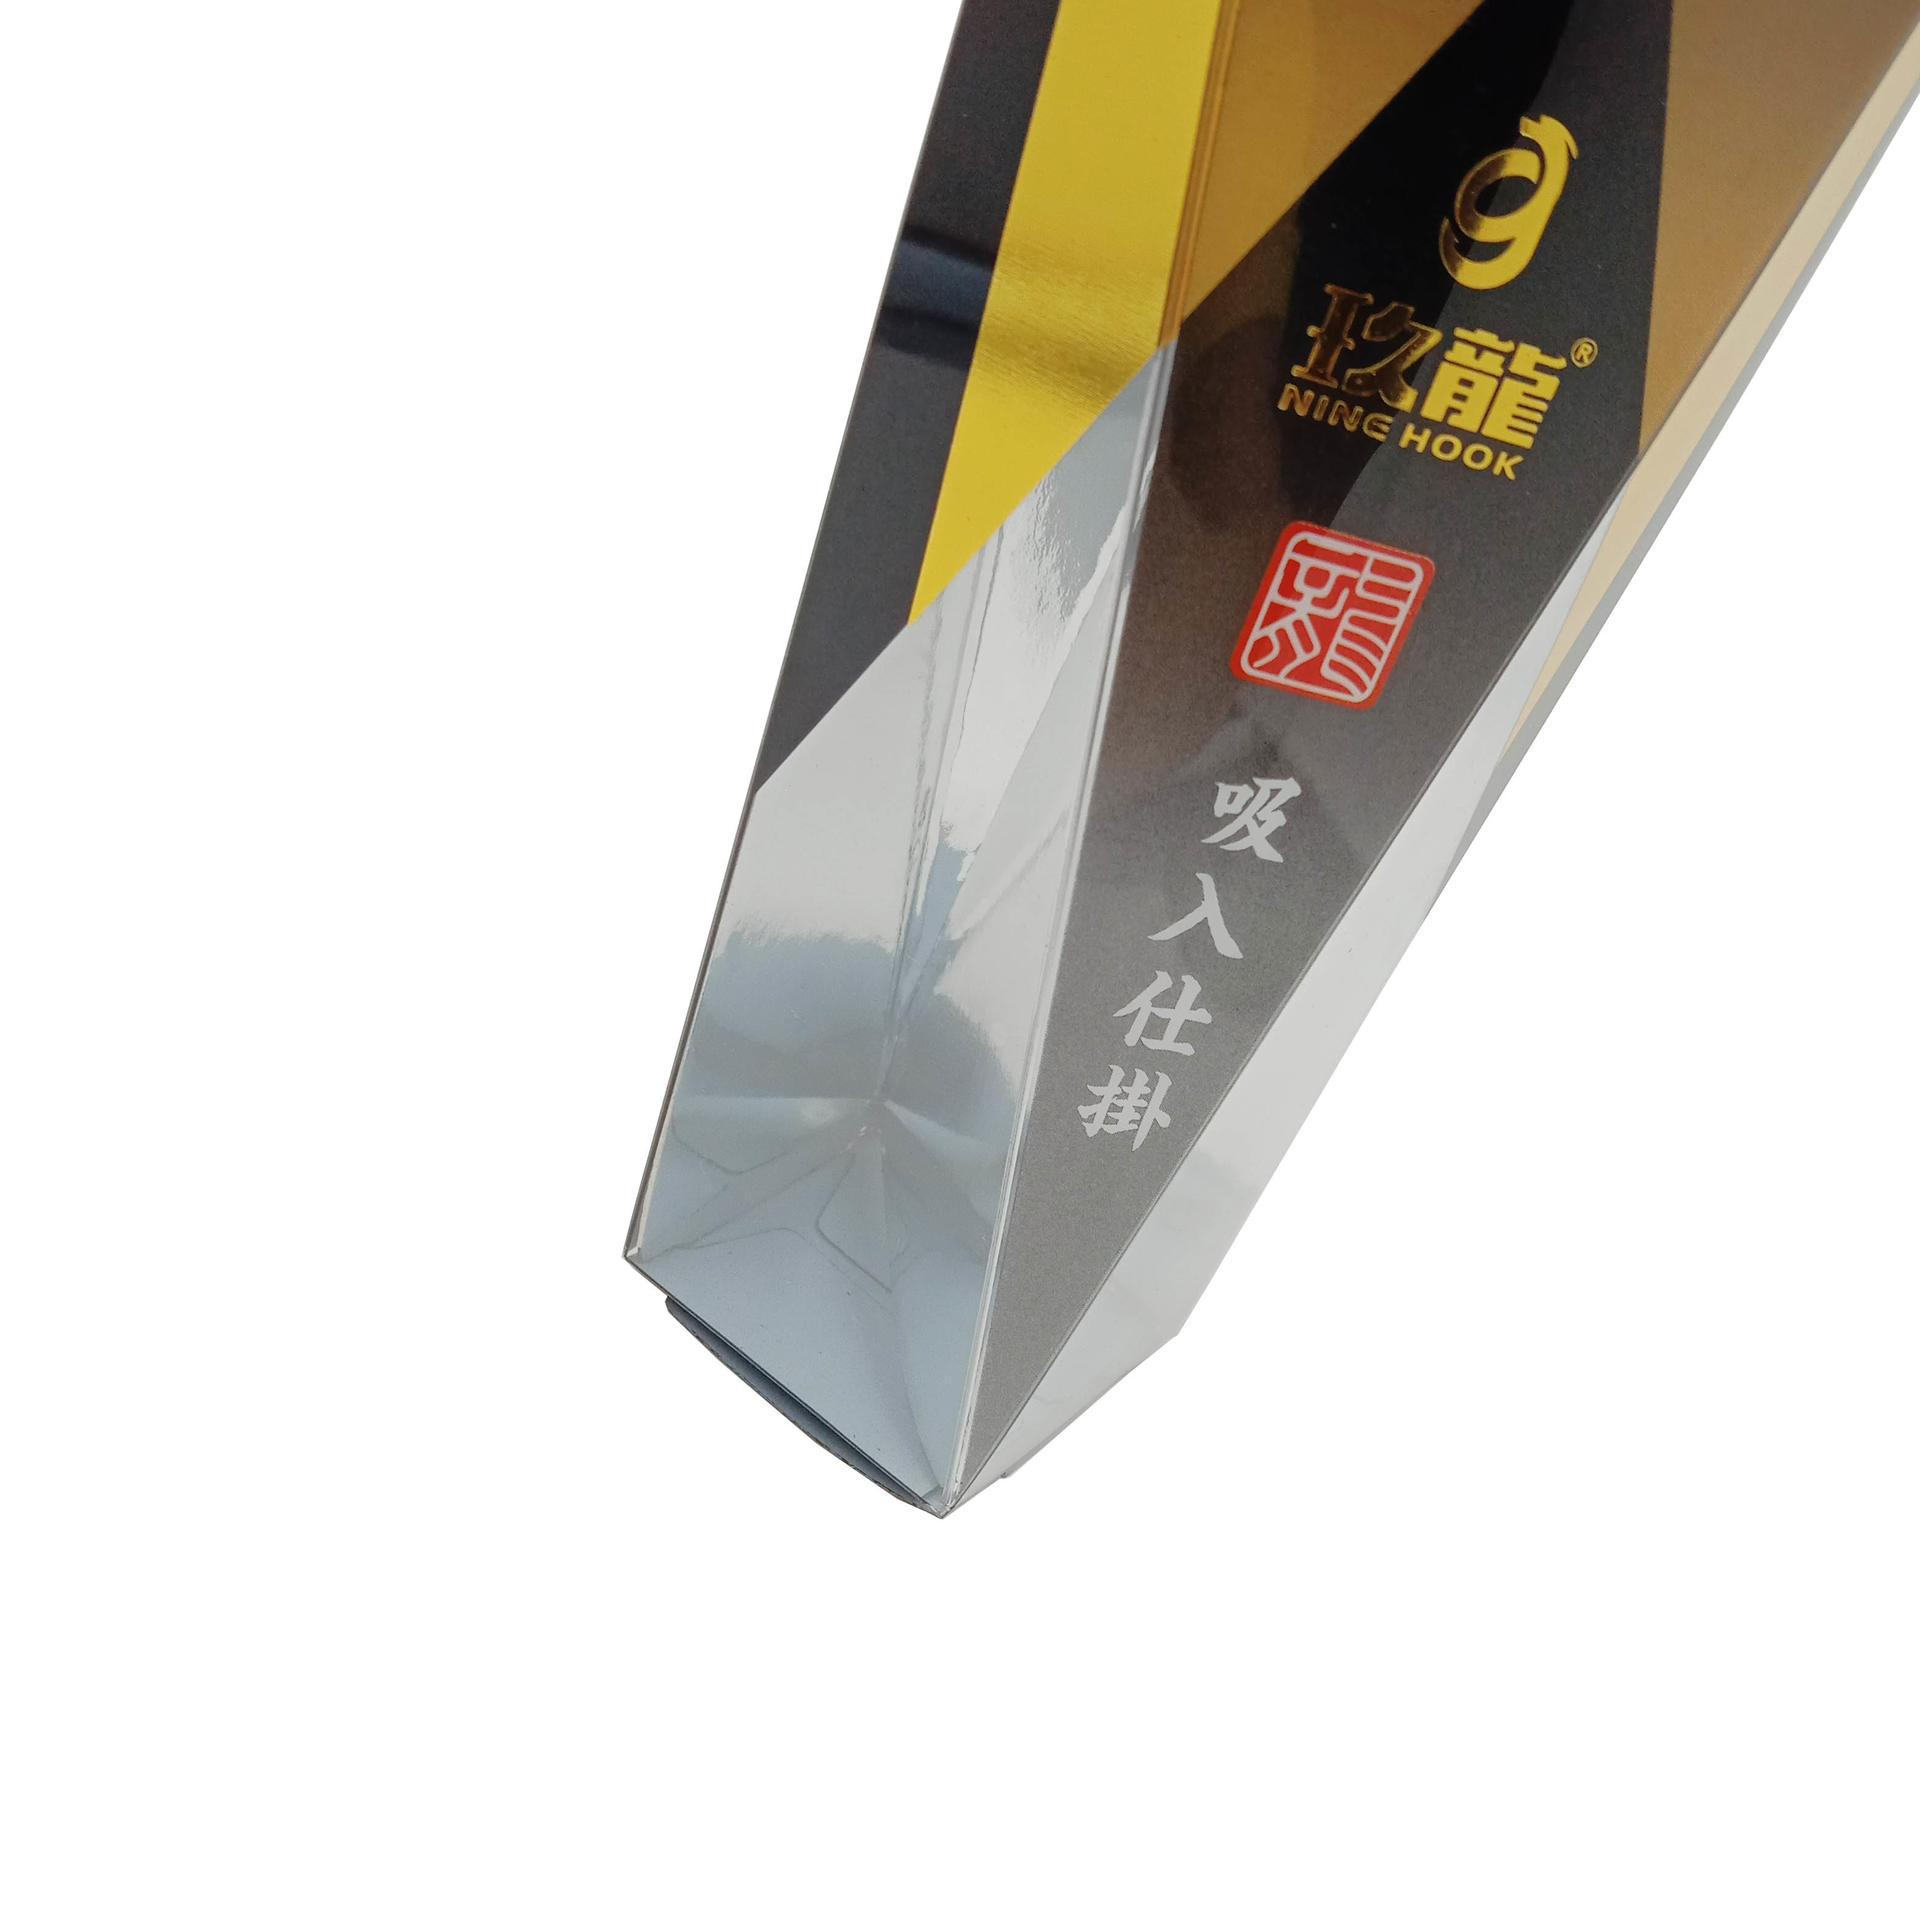 Irregular PET Plastic Custom Packaging with Hanger Hole